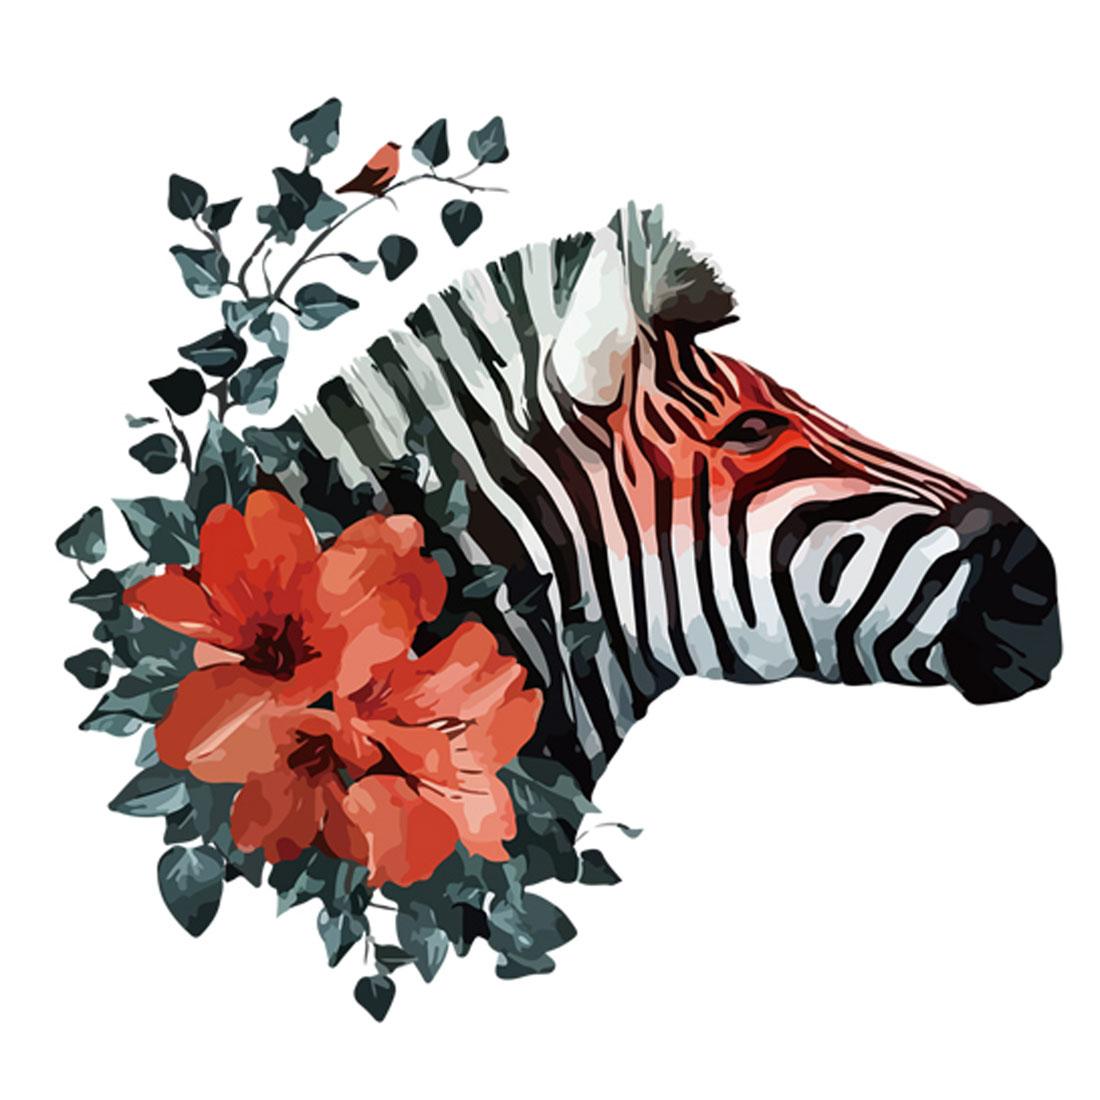 Bedroom PVC Zebra Flower Pattern DIY Decor Wall Sticker Decal Mural 50 x 70cm